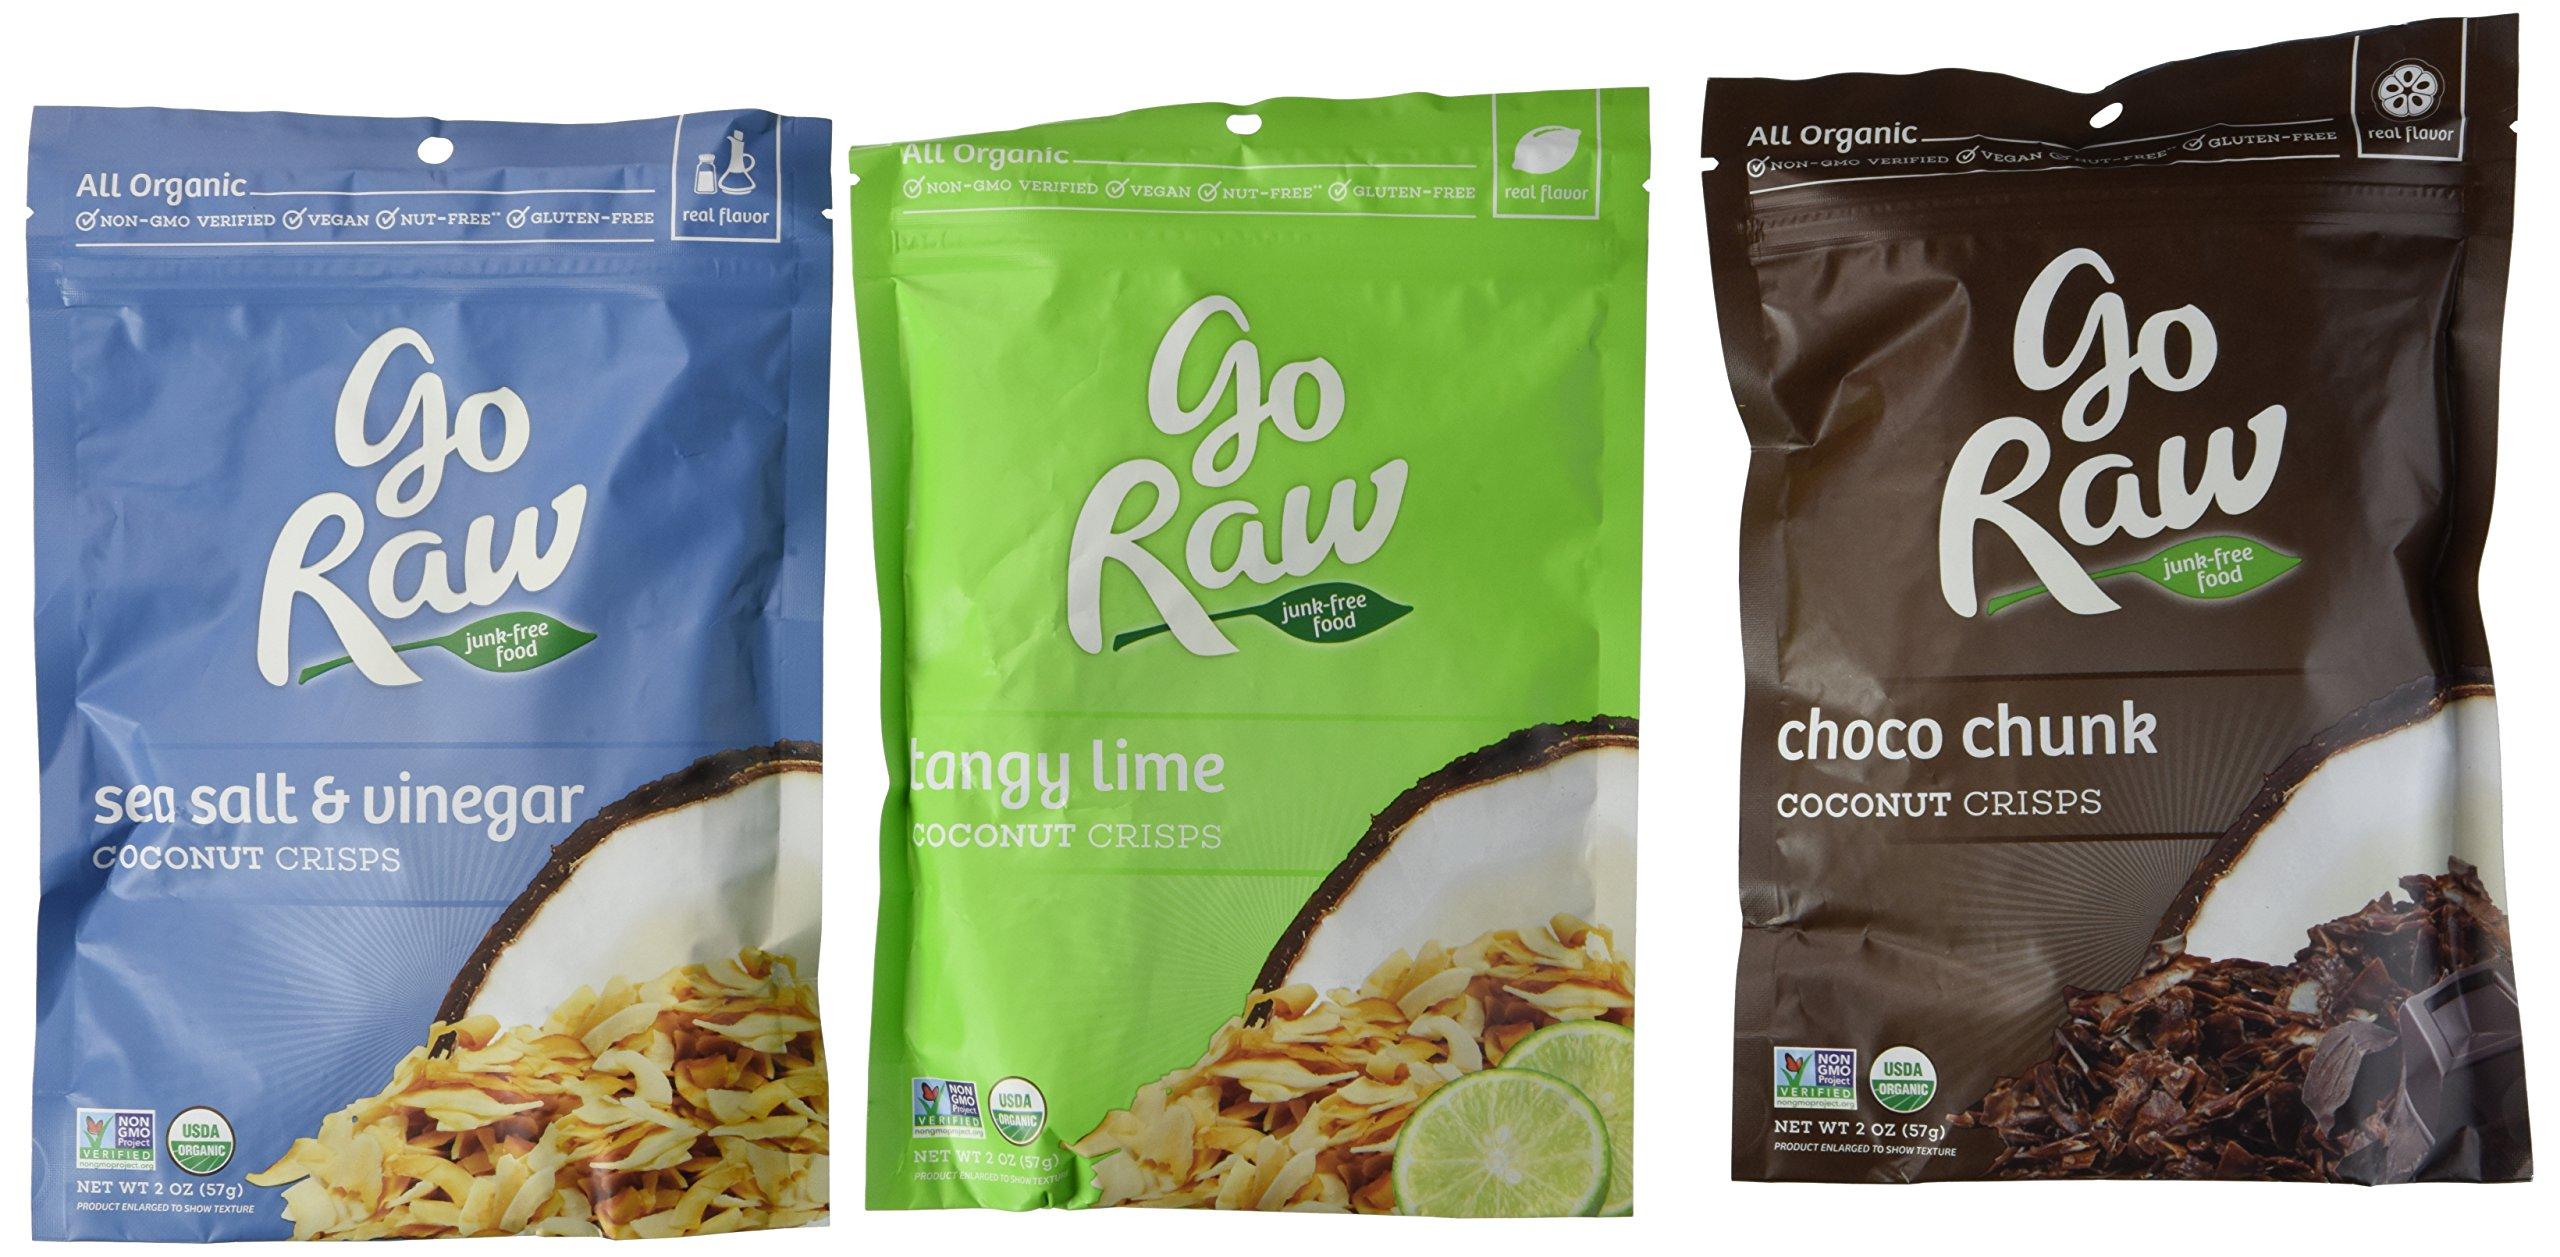 Go Raw All Organic Gluten-Free Coconut Crisps 3 Flavor Variety Bundle: (1) Go Raw Organic Choco Chunk Coconut Crisps, (1) Go Raw Organic Tangy Lime Coconut Crisps, and (1) Go Raw Organic Sea Salt & Vinegar Coconut Crisps, 2 Oz. Ea. (3 Bags Total)